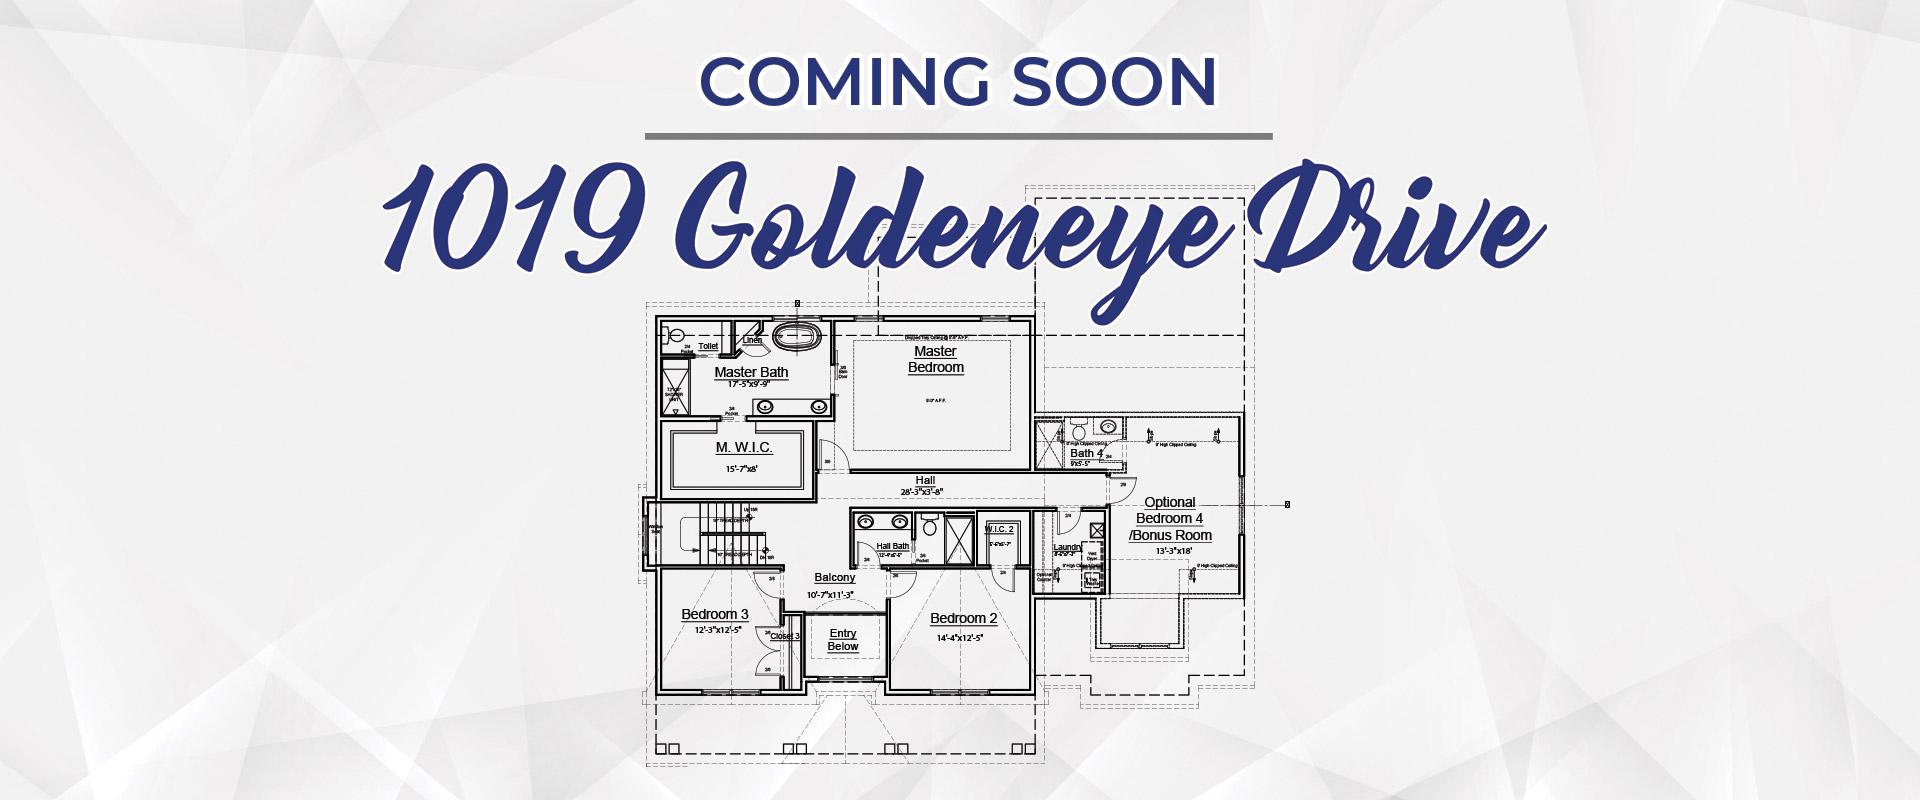 1019 Goldeneye Drive in Mallard Pond